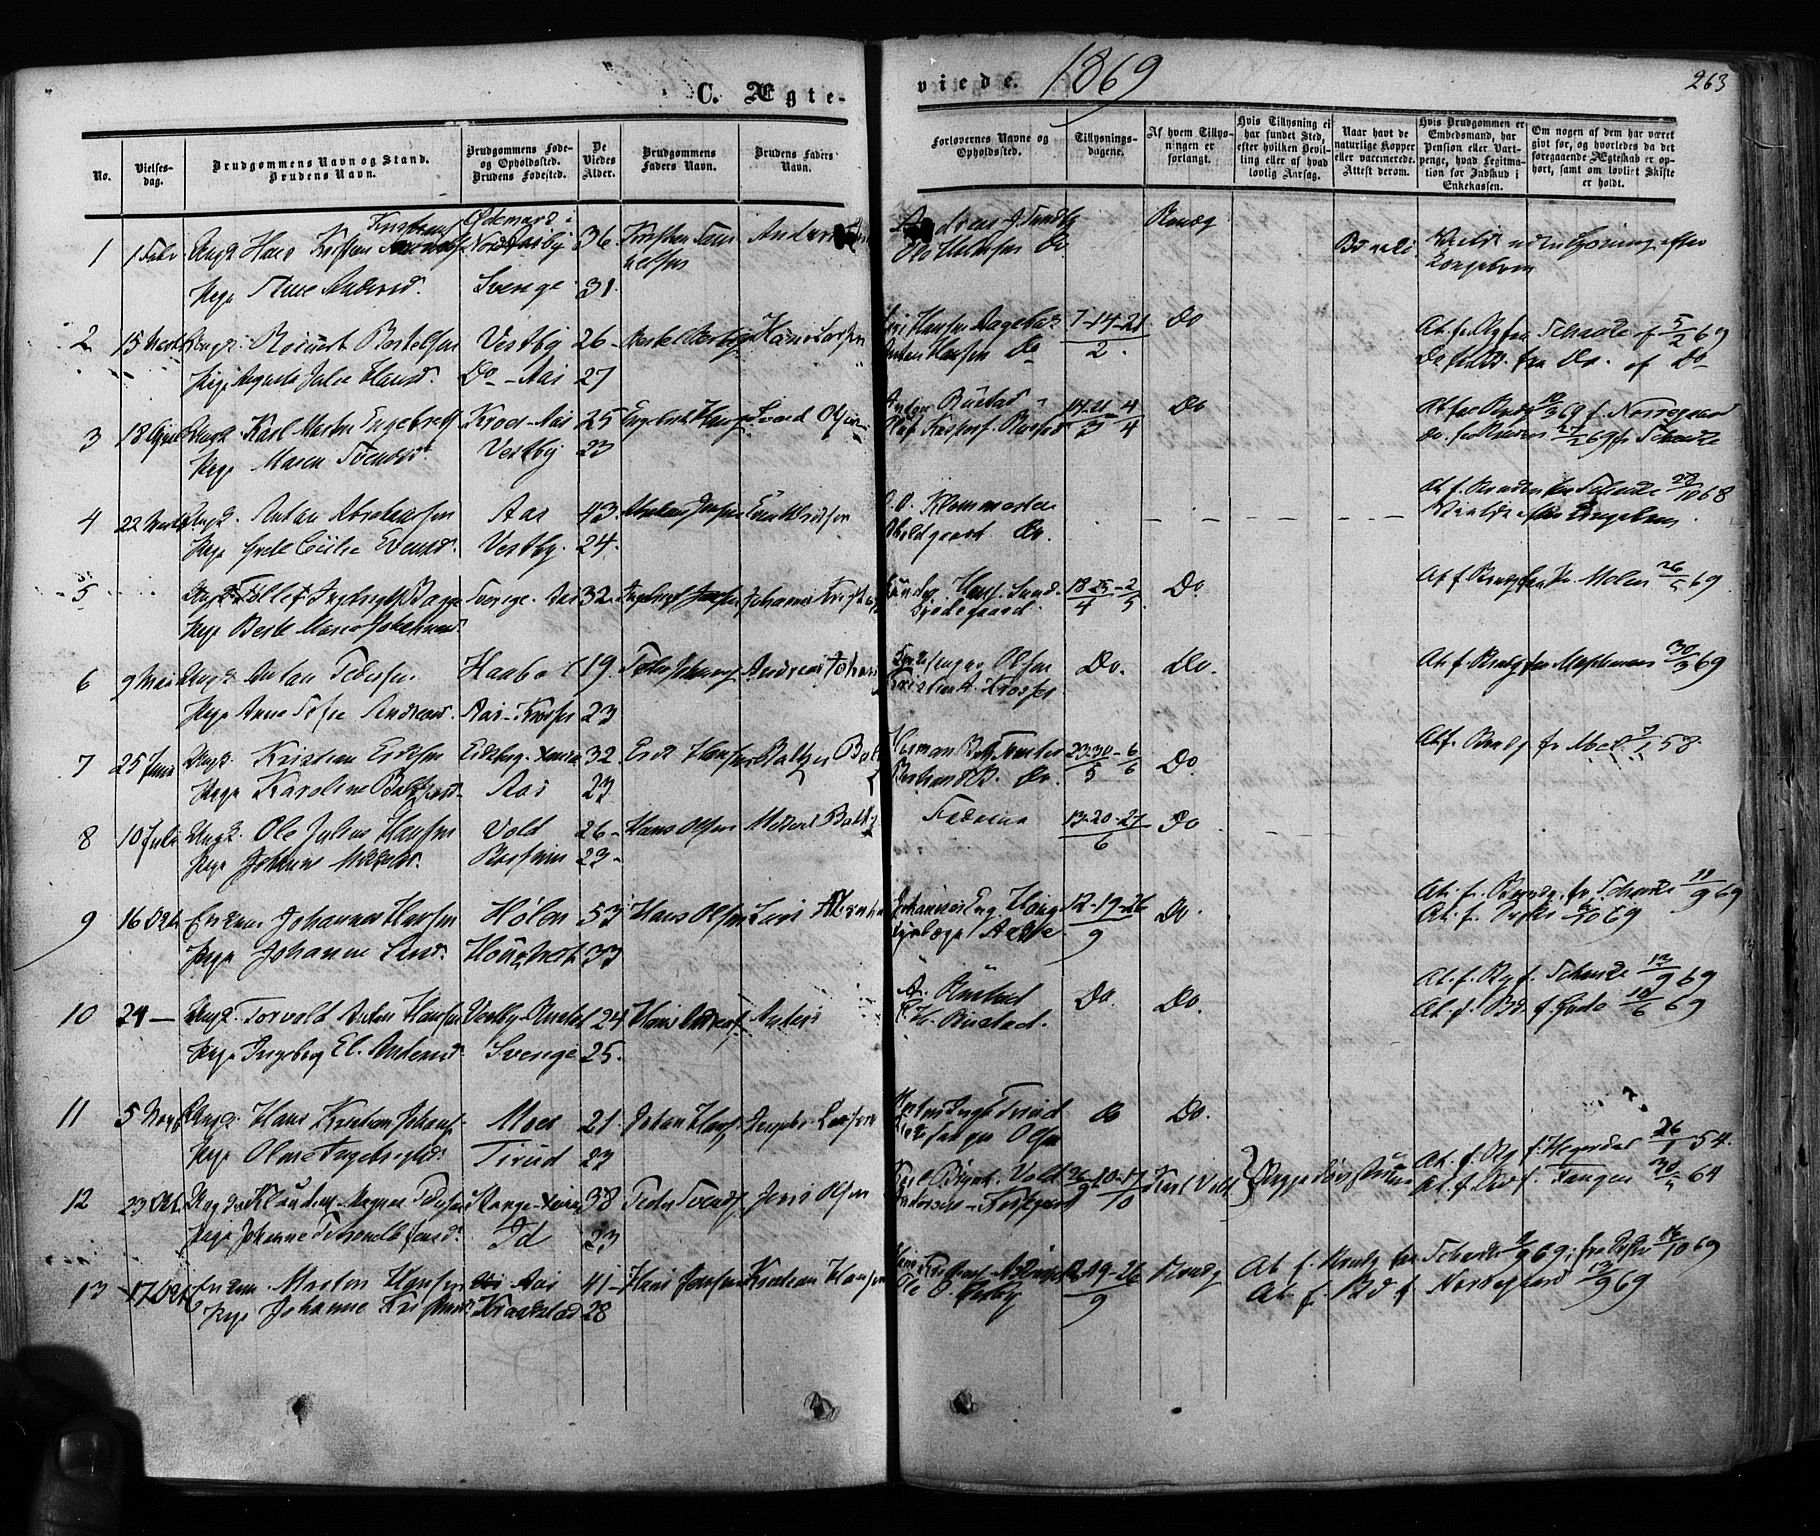 SAO, Ås prestekontor Kirkebøker, F/Fa/L0007: Ministerialbok nr. I 7, 1854-1870, s. 263